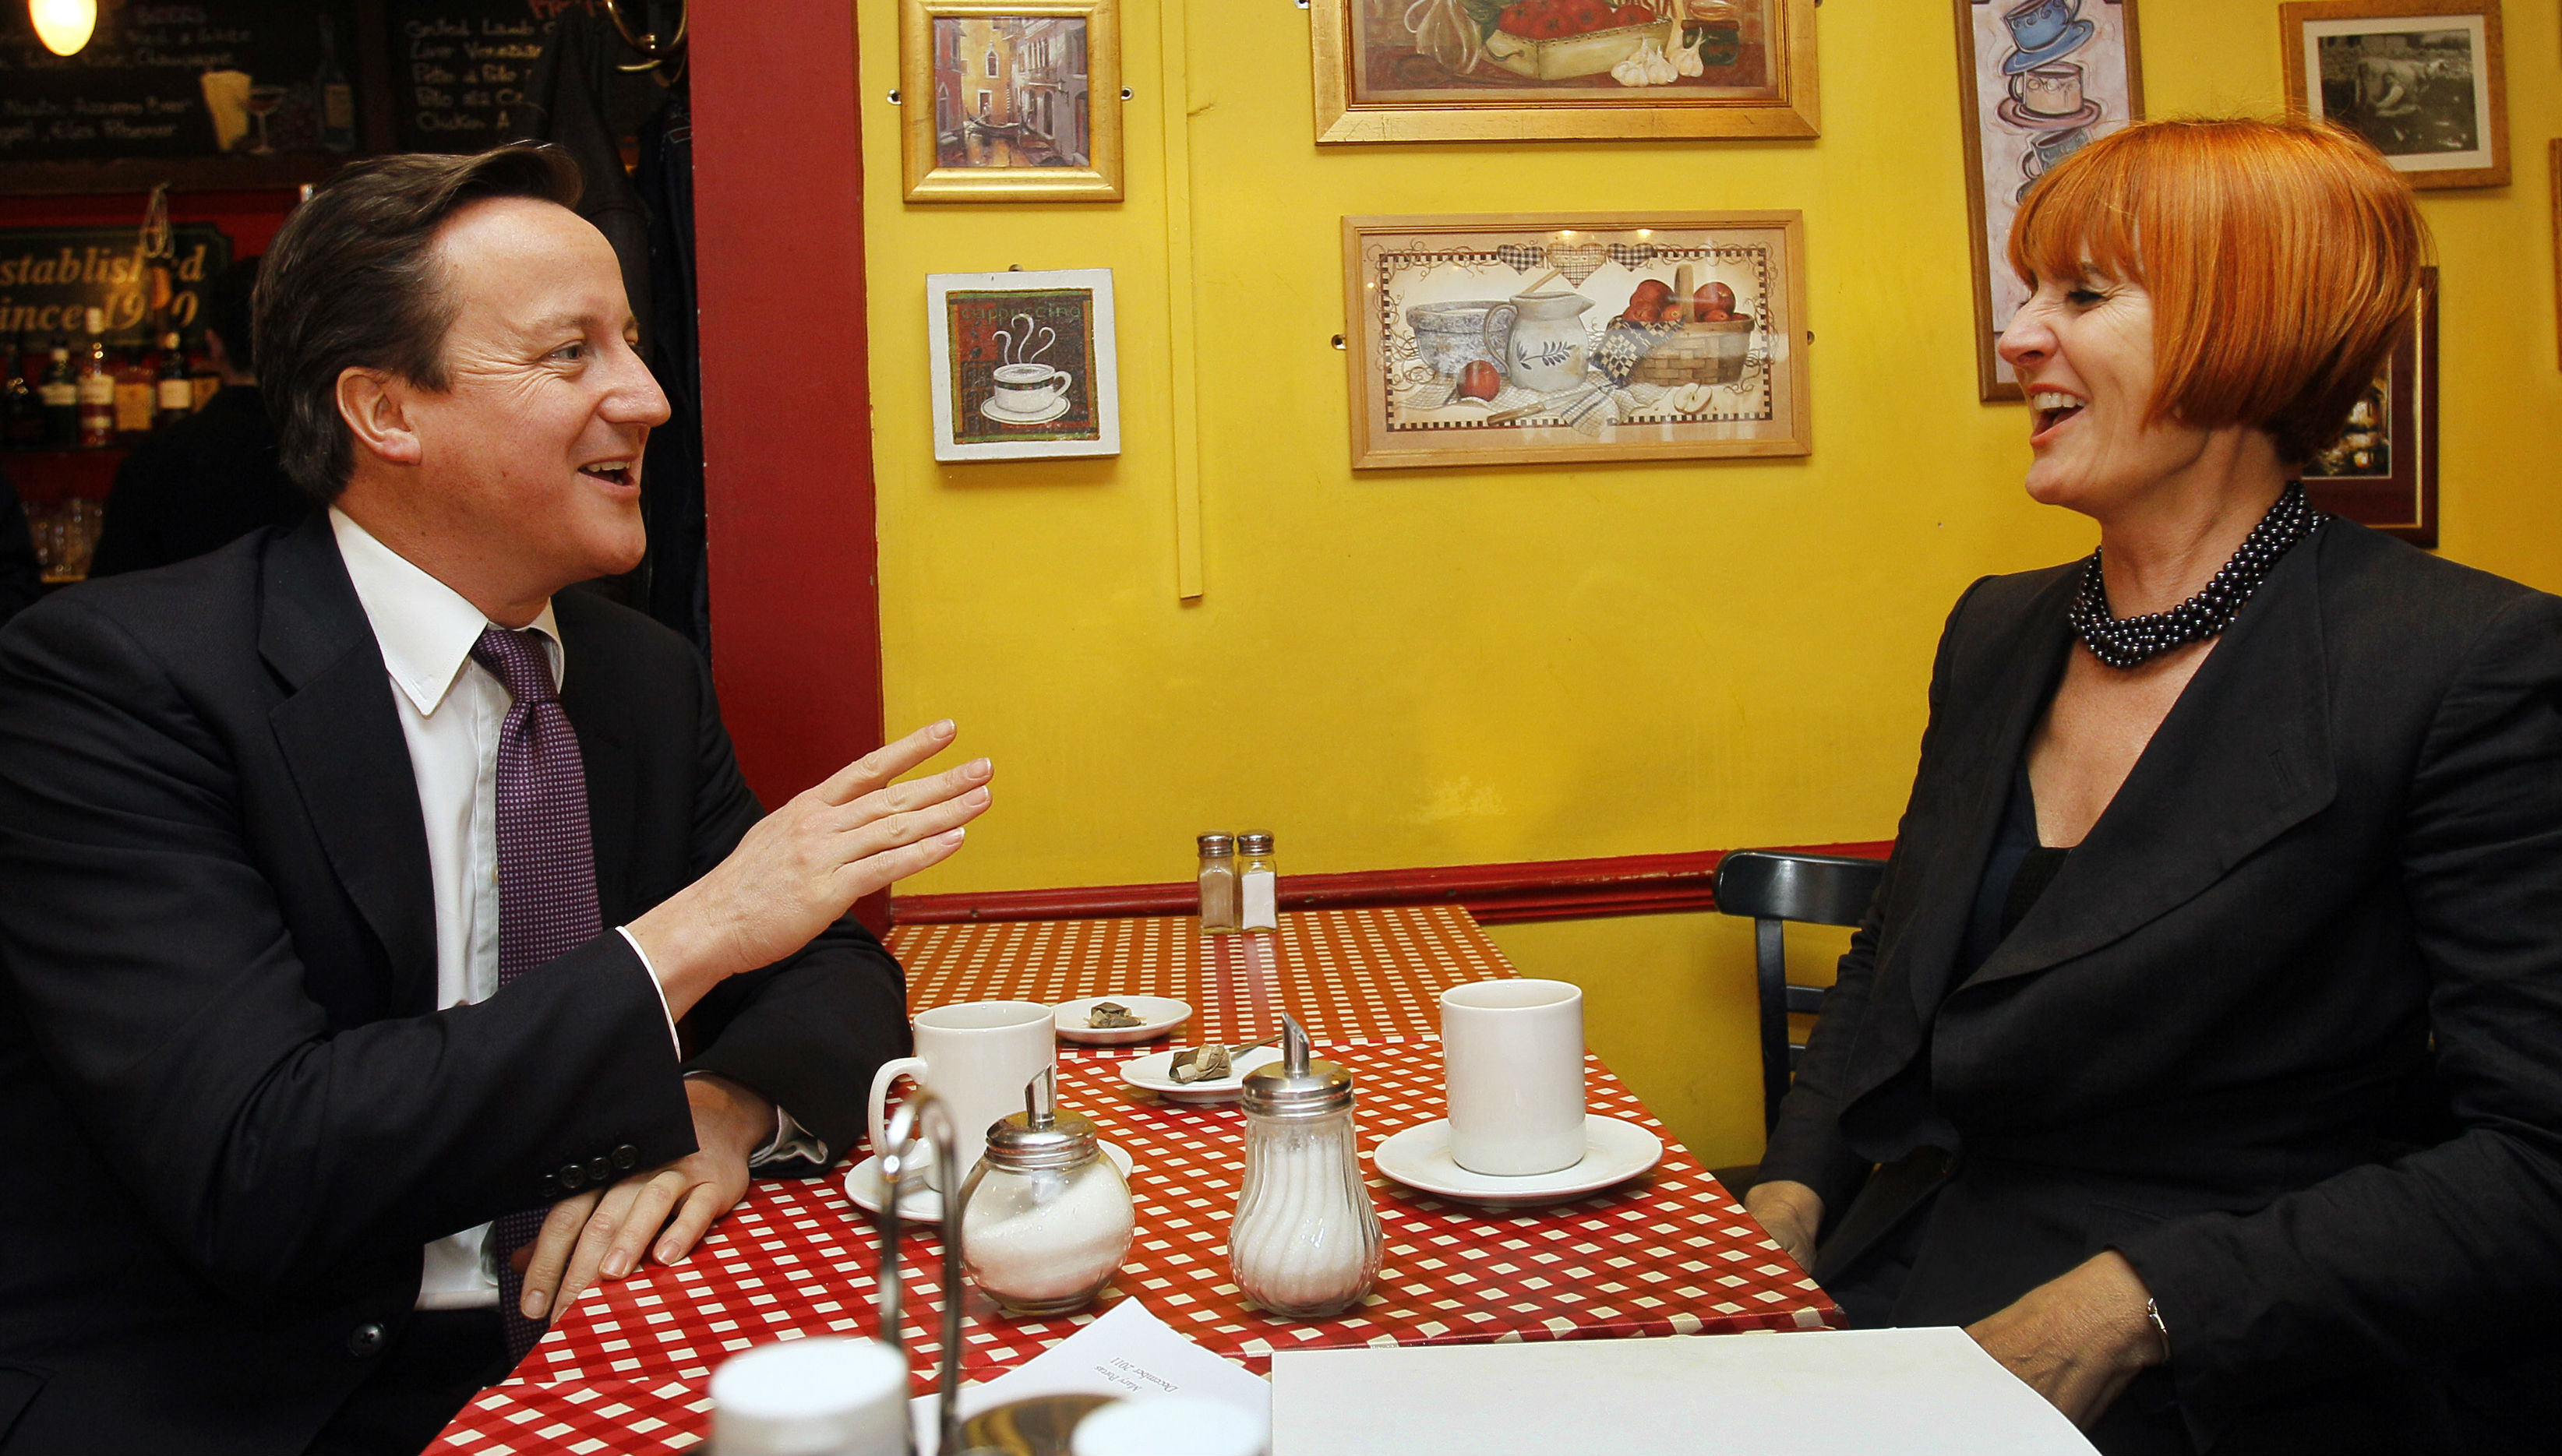 Mary Portas and David Cameron (reuters)